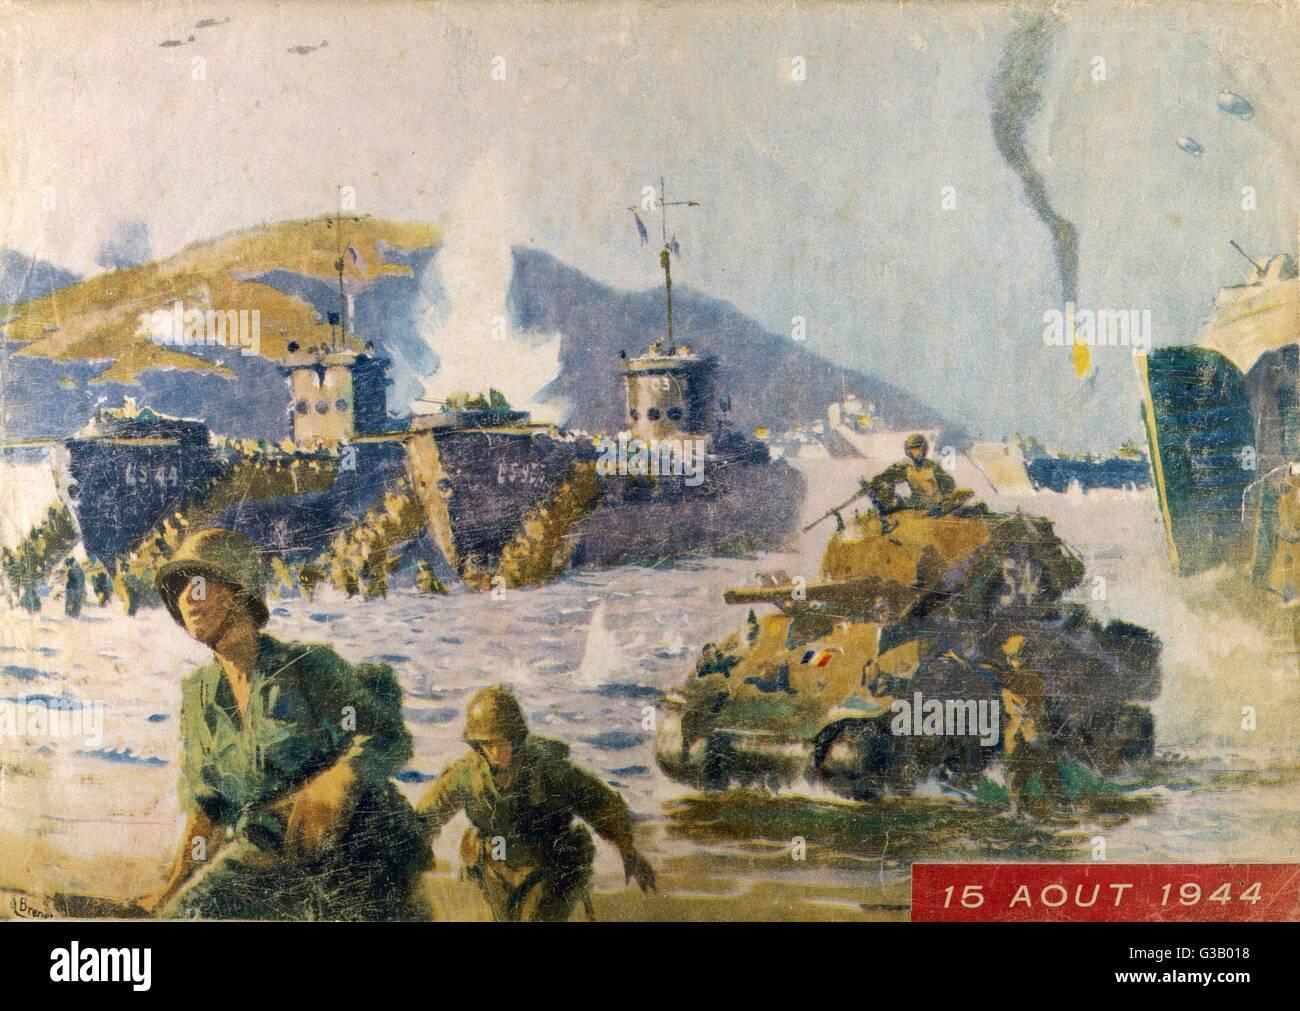 US war model in Normandy – 2